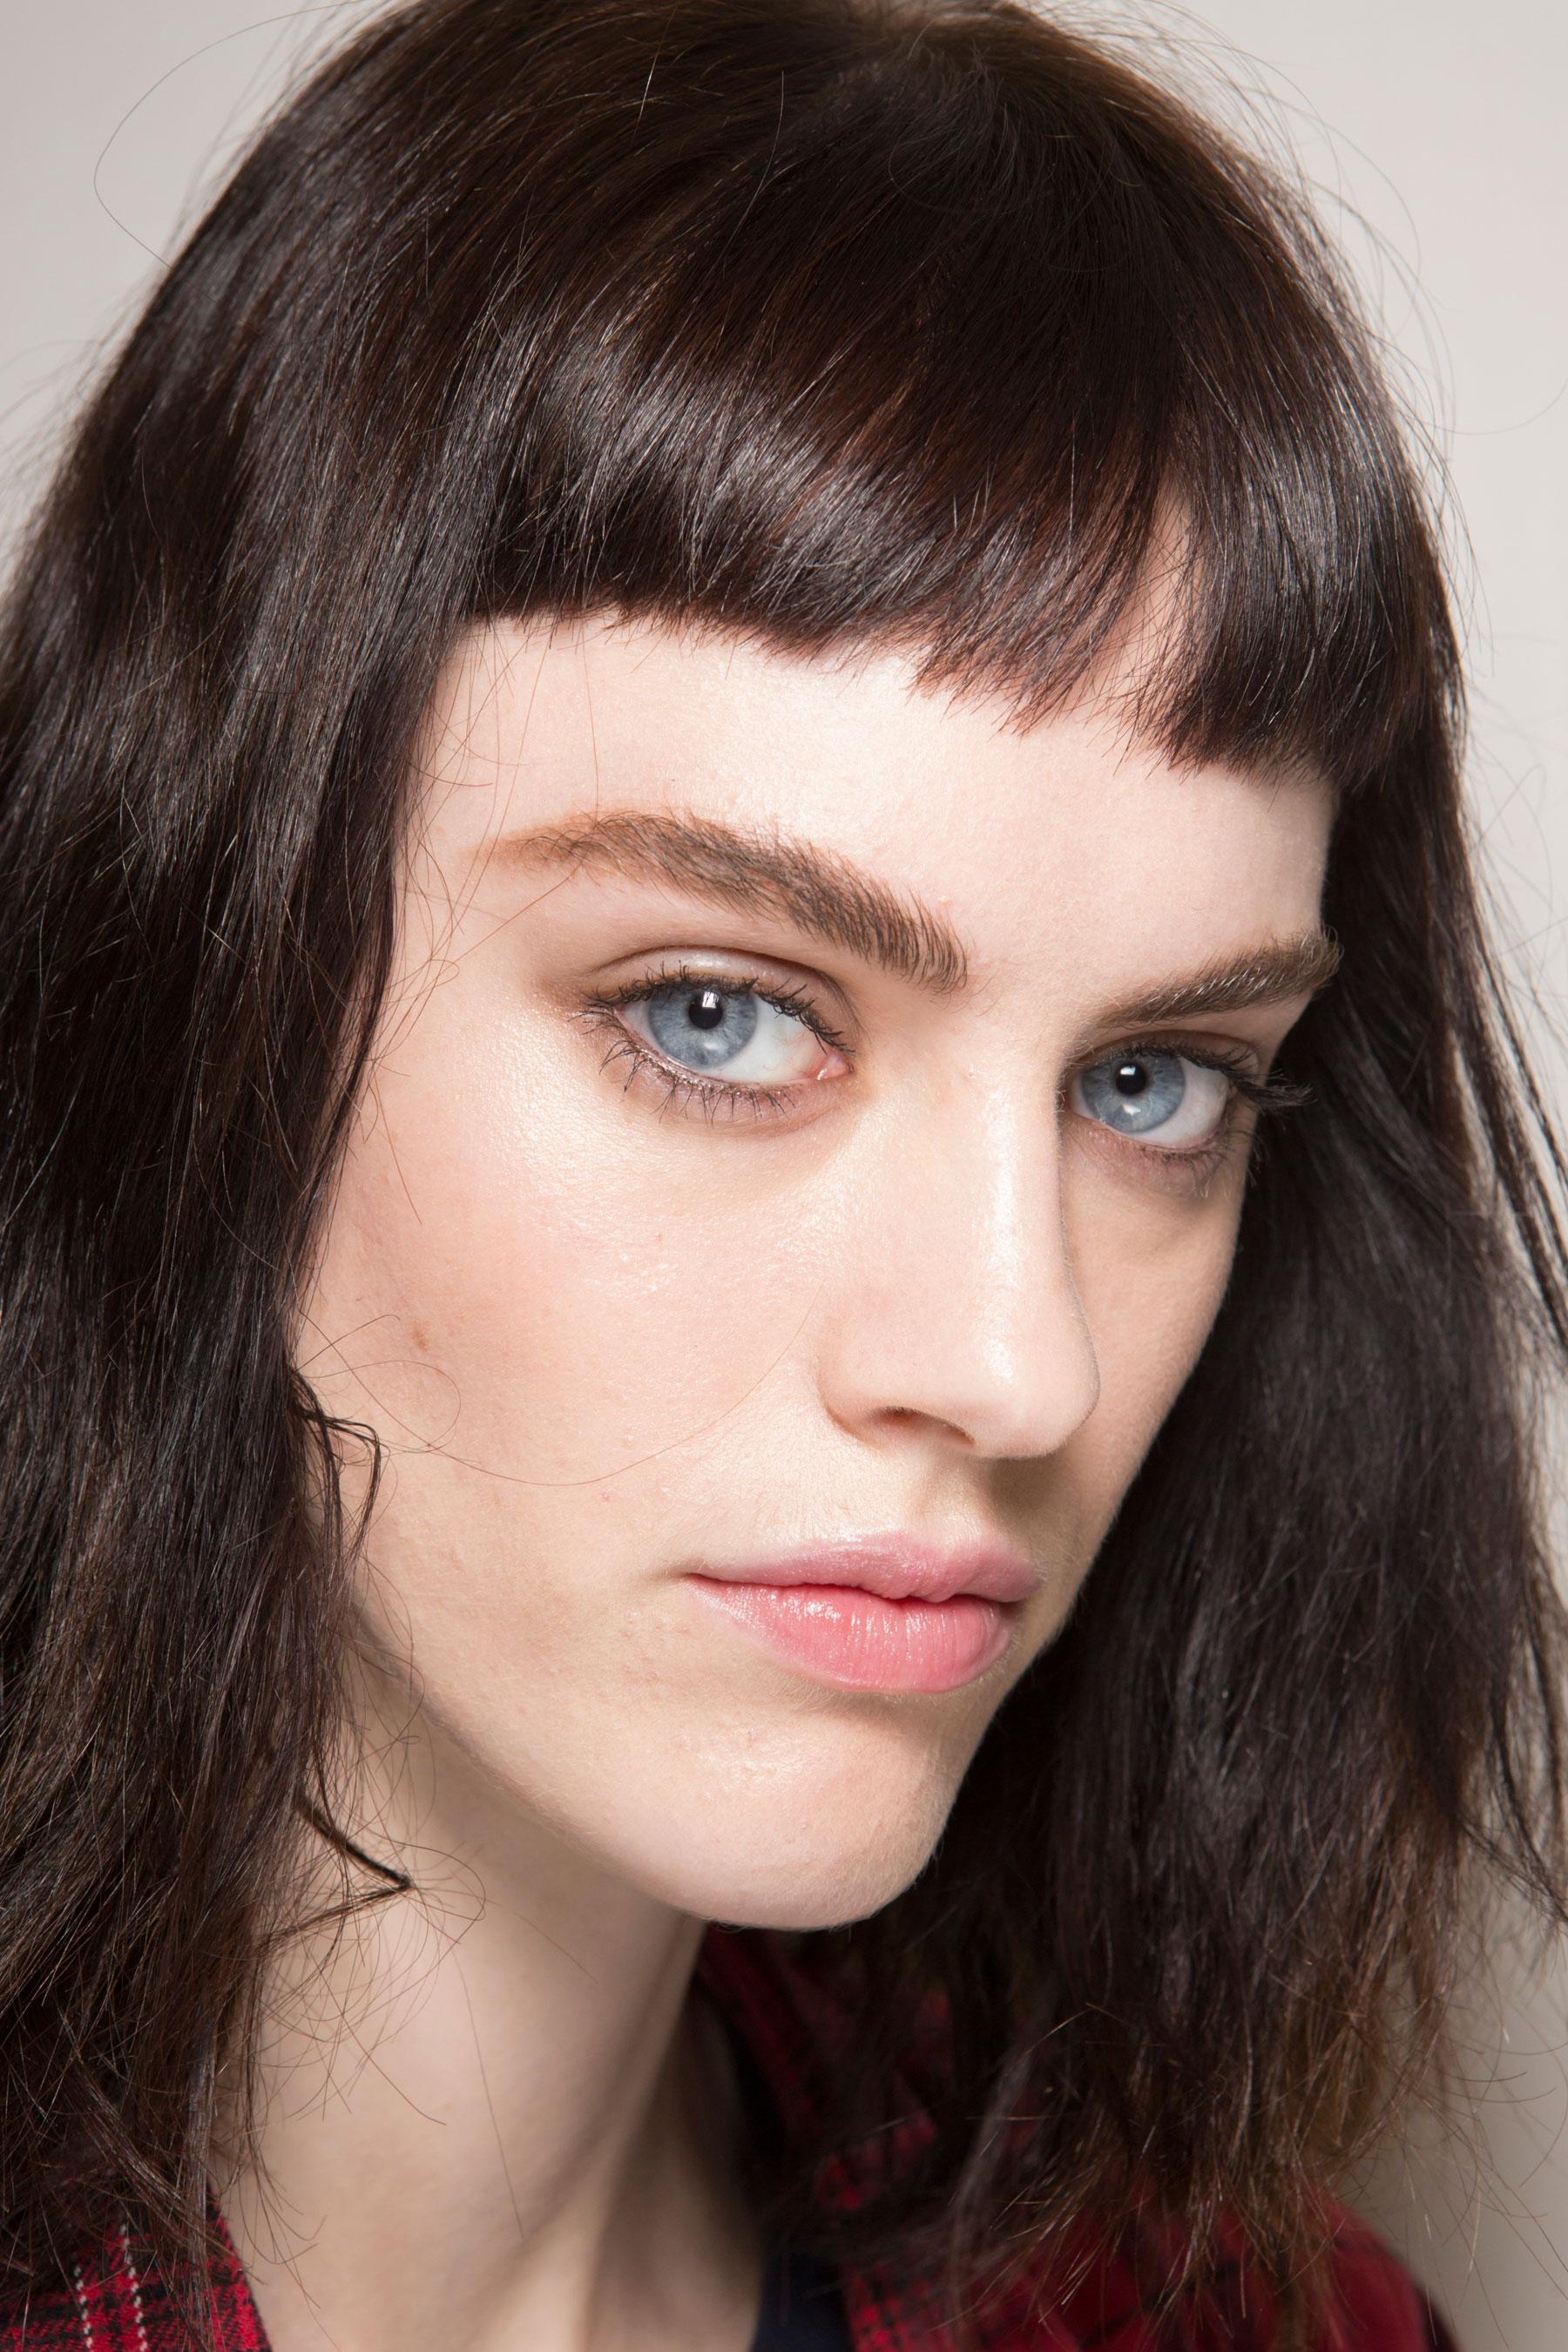 Roberto-Cavalli-Backstage-beauty-spring-2016-close-up-fashion-show-the-impression-108